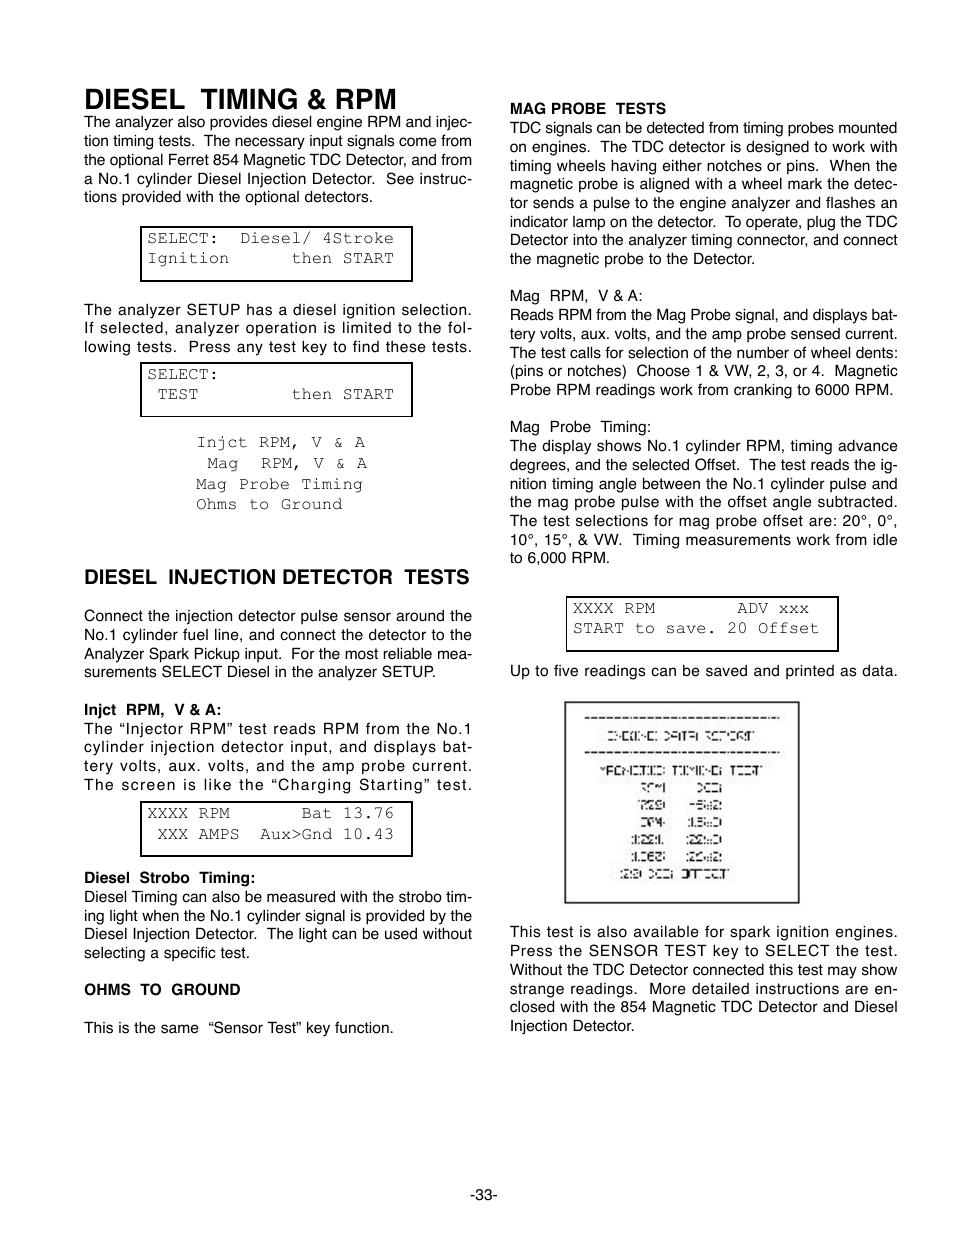 Diesel timing & rpm, Diesel injection detector tests | GxT Ferret 63  DIAGNOSTIC ENGINE ANALYZER